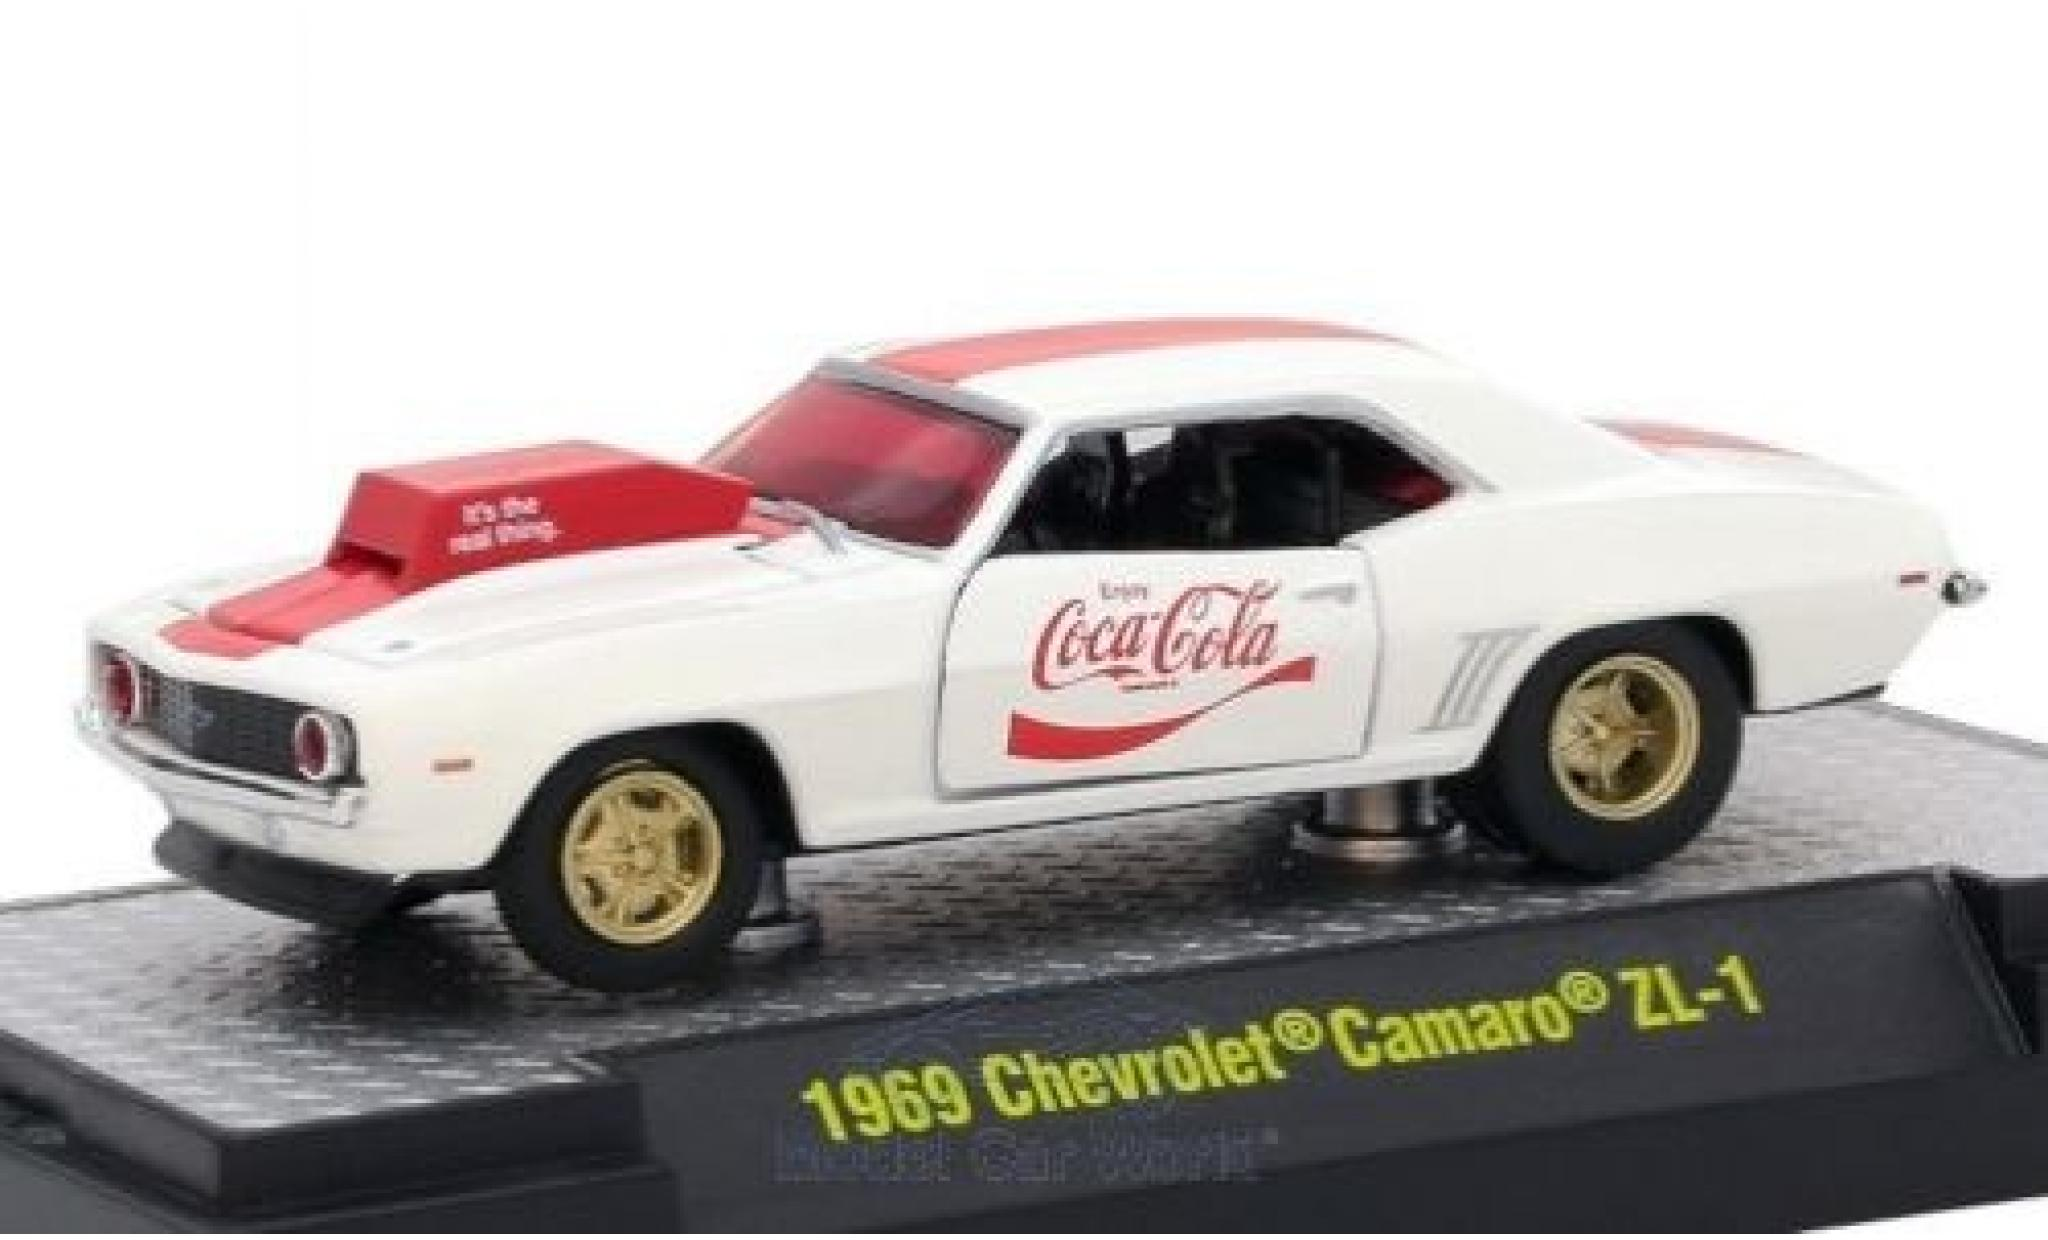 Chevrolet Camaro ZL1 1/64 M2 Machines bianco/rosso Coca Cola 1969